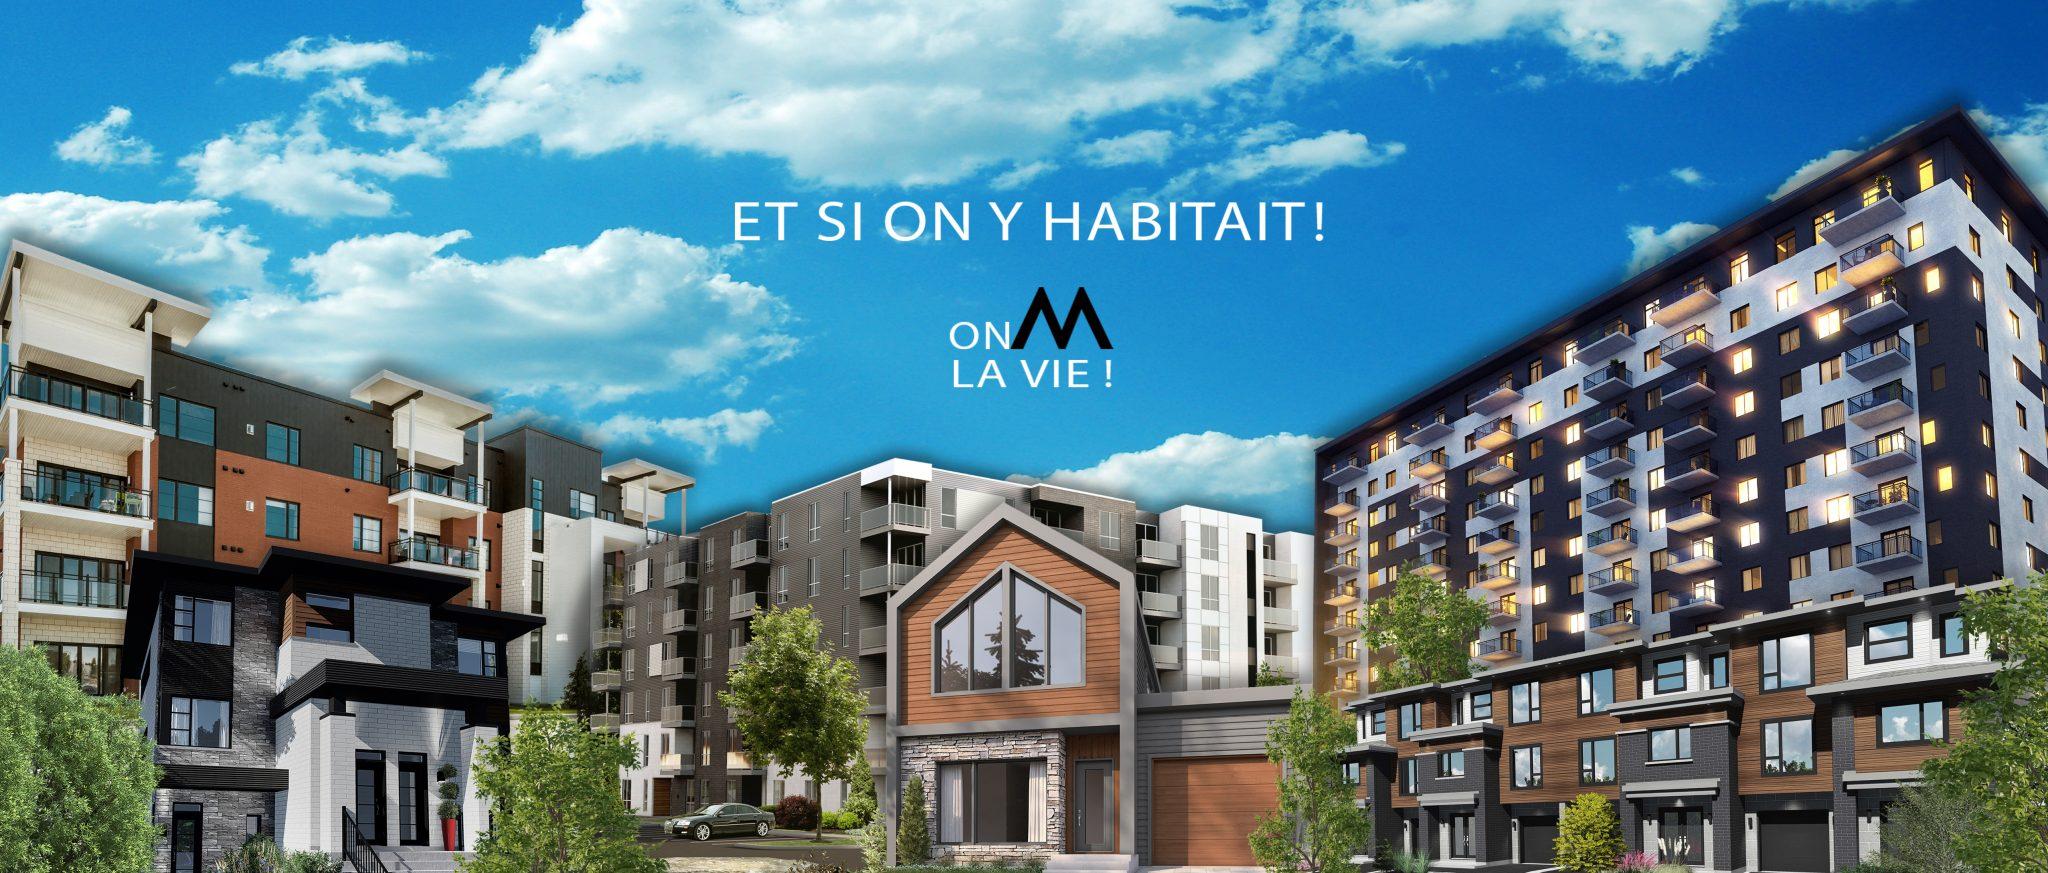 Maison Mirabel - Slogan - Constructions neuves a Mirabel